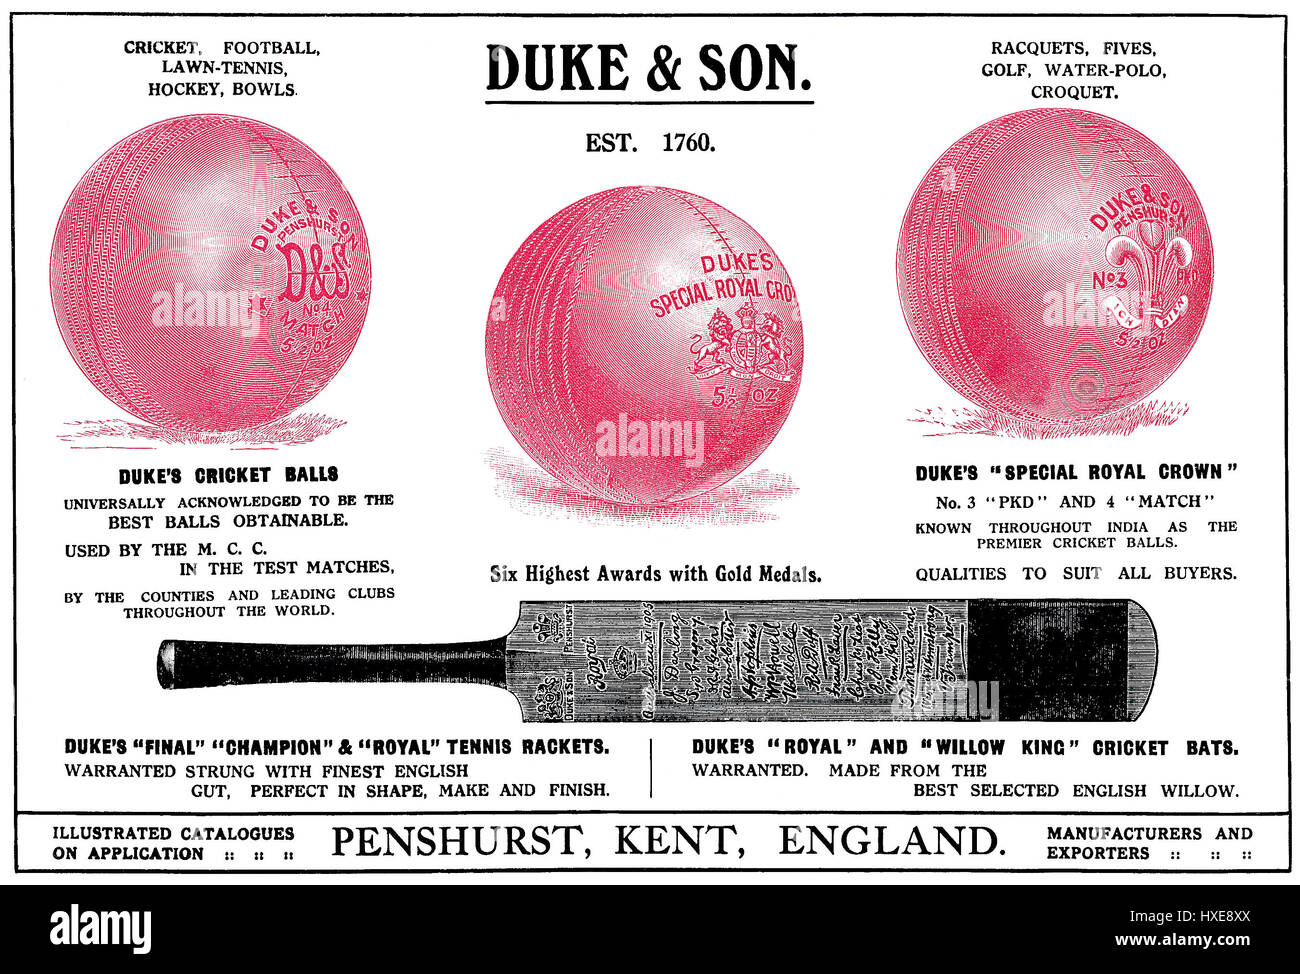 1922 Anuncio indio de Duke & Son deportes de equipo. Publicado en The Times of India, Anual de 1922. Imagen De Stock